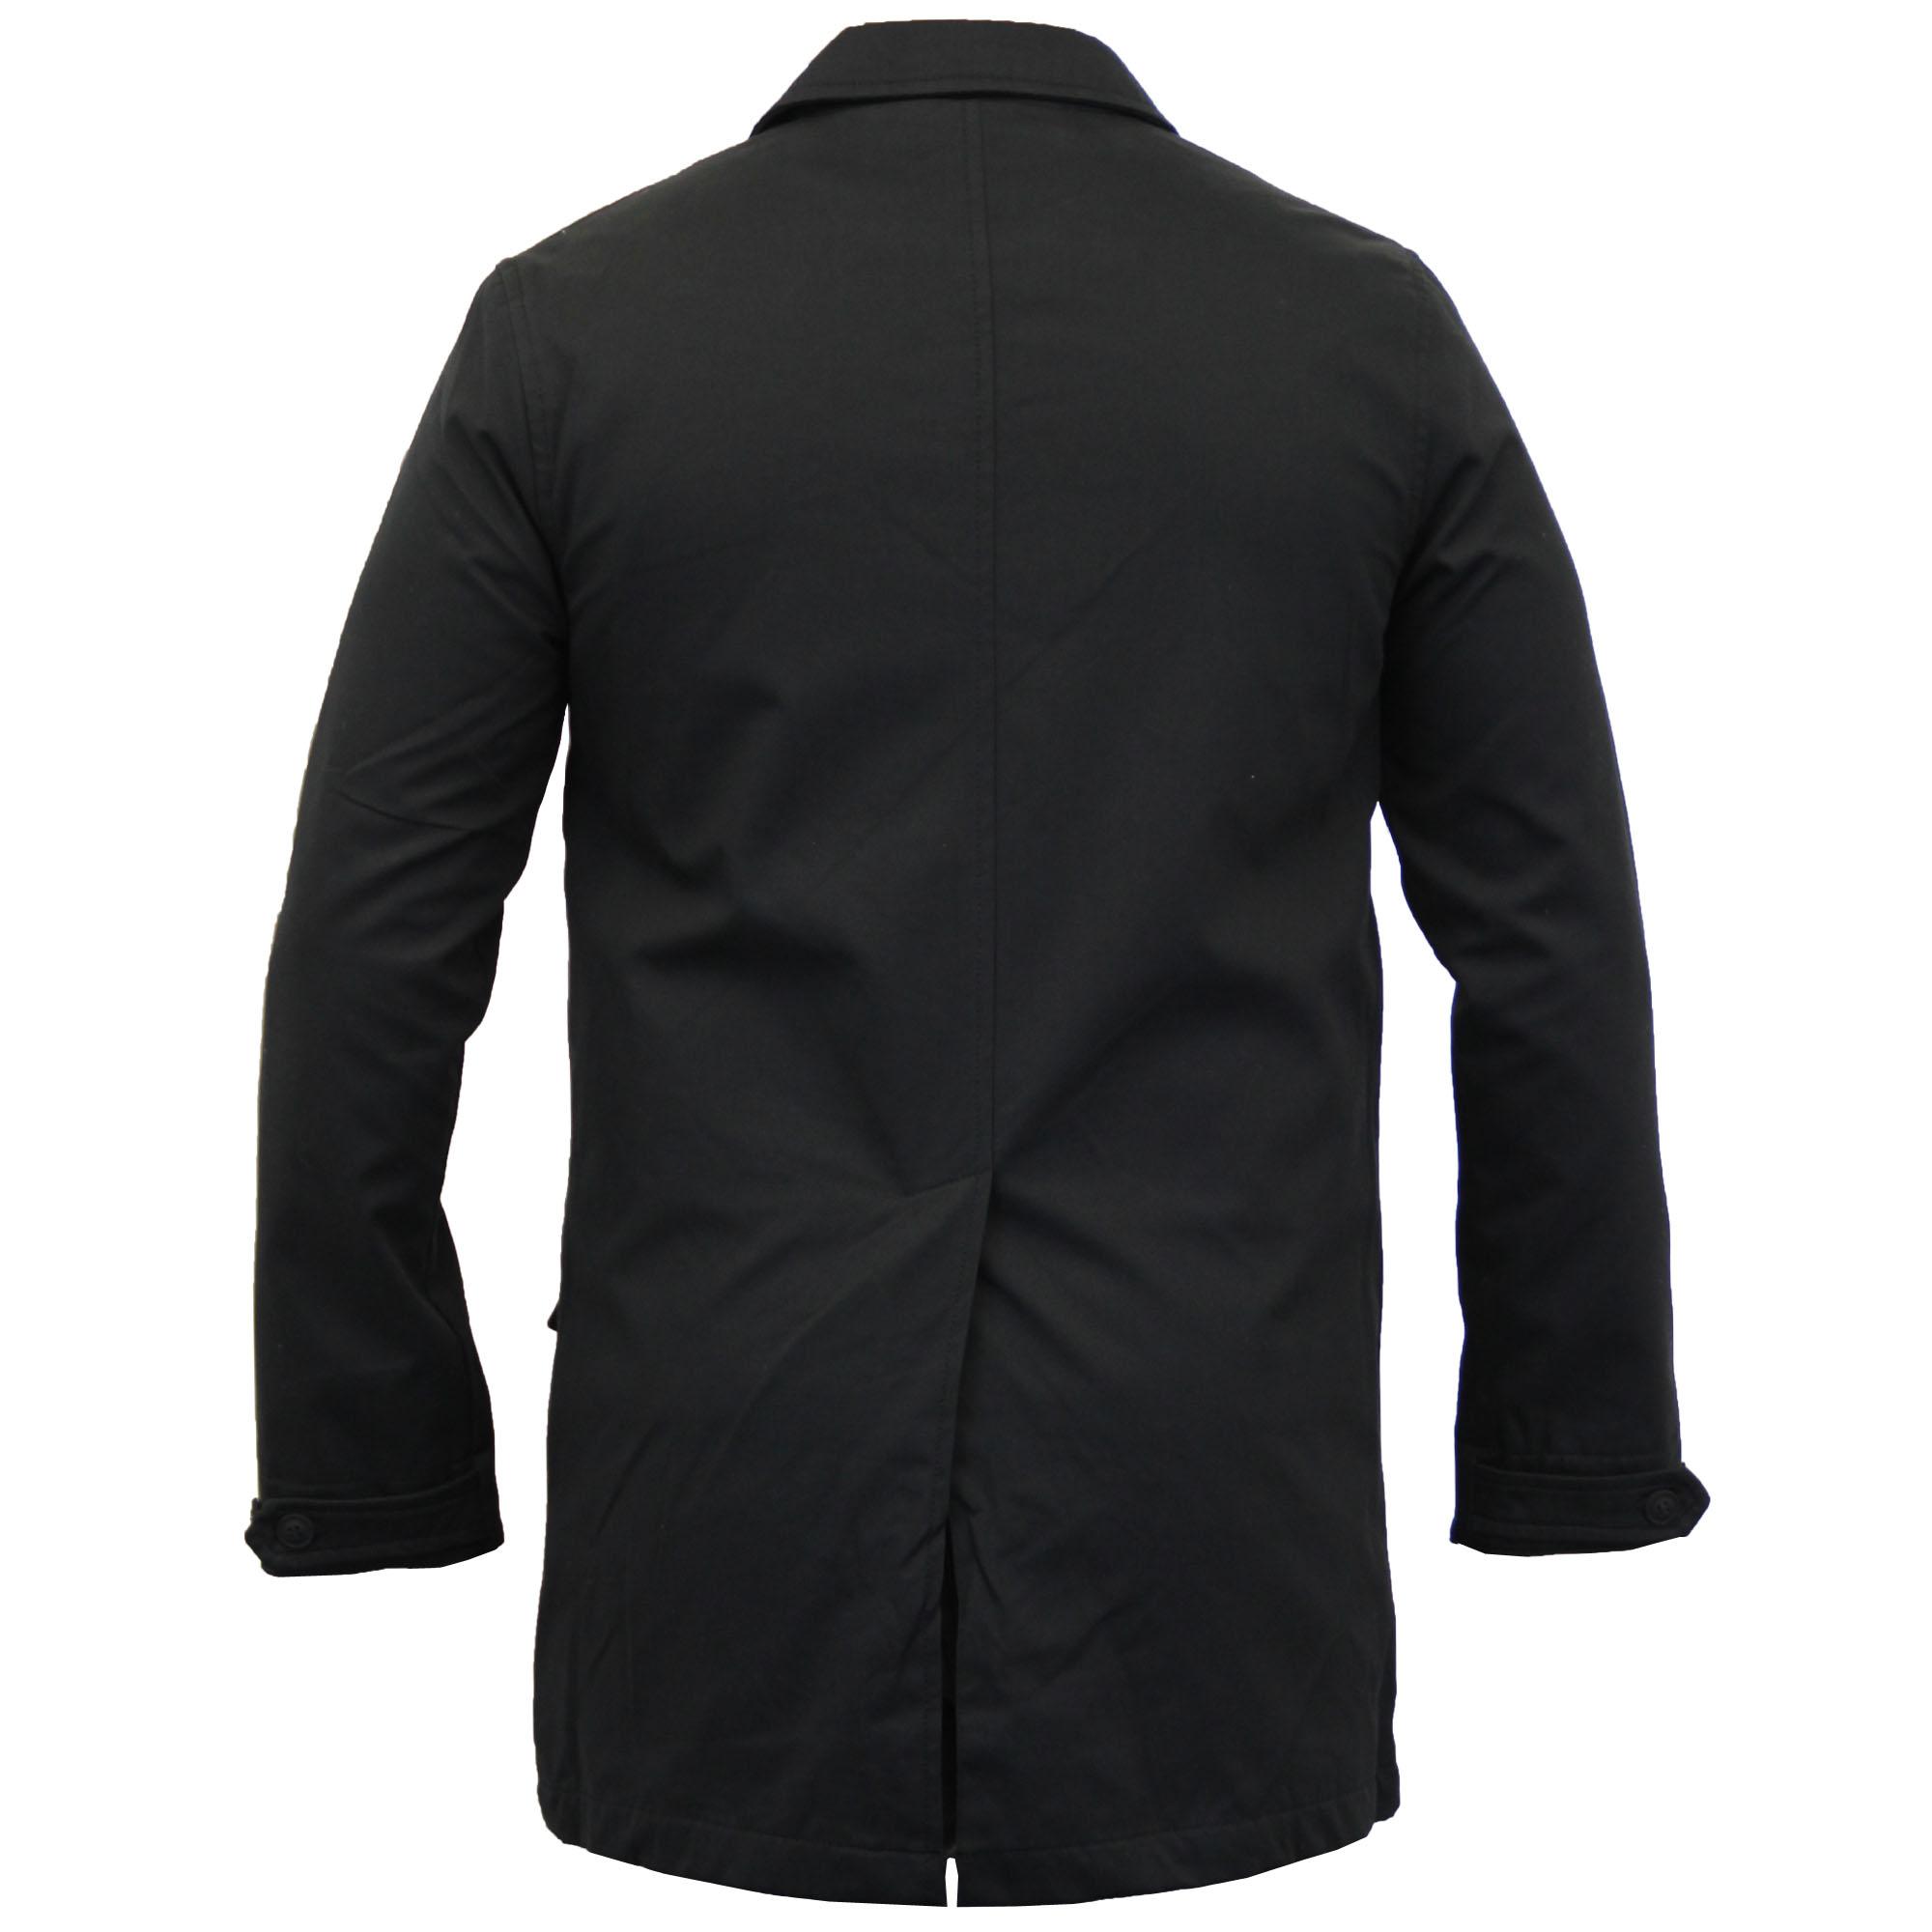 Mens Jackets Brave Soul Long Coat Mac Trench Cotton Smart